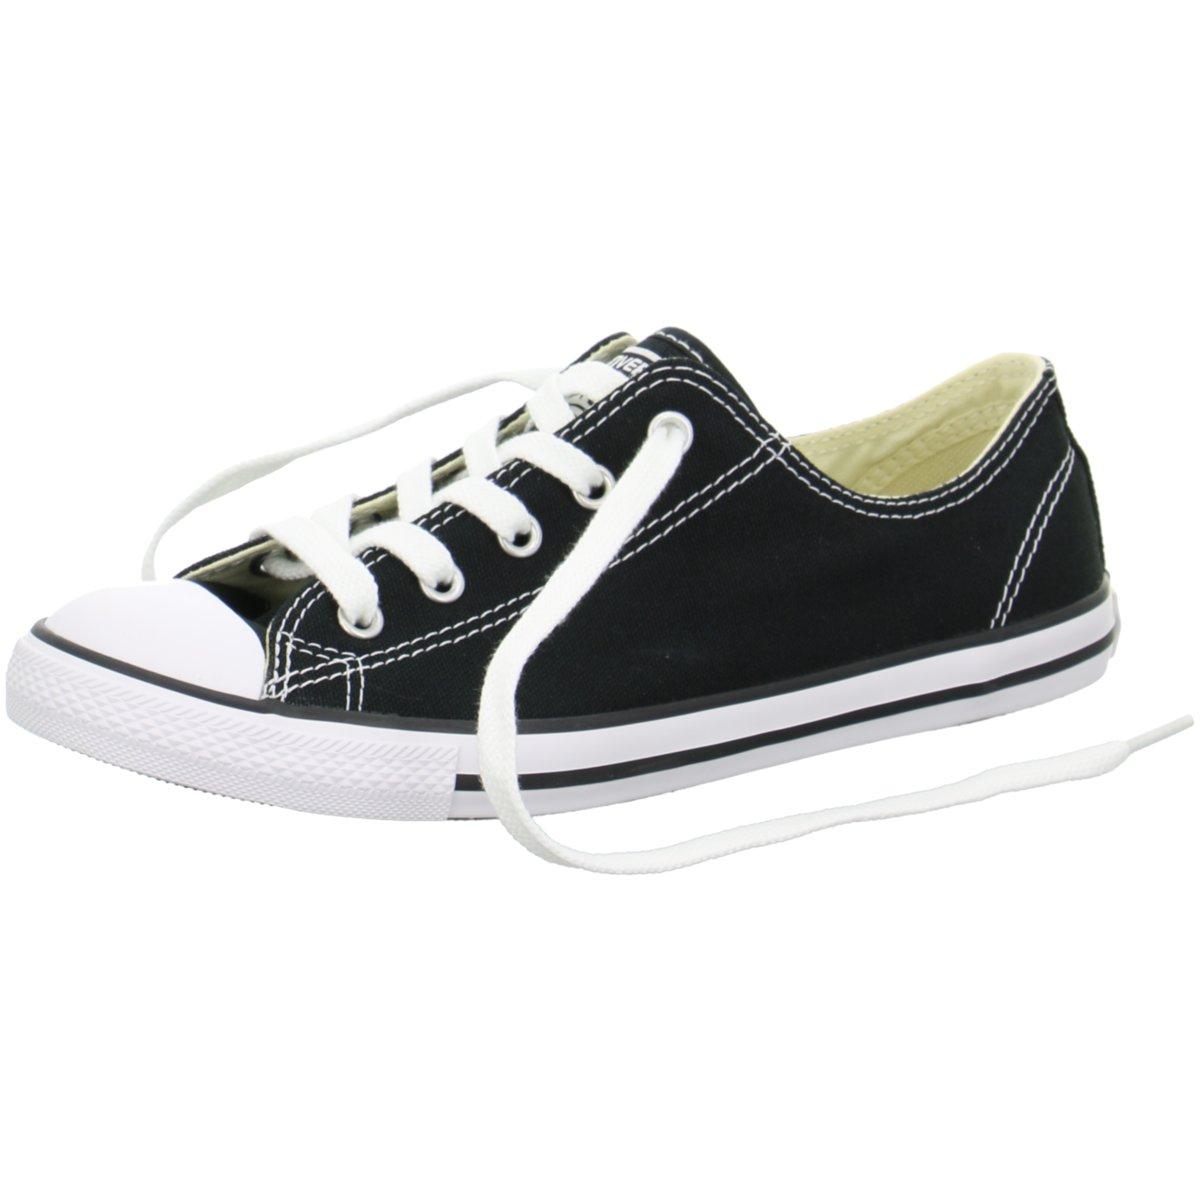 NEU Converse Damen Sneaker CHUCK TAYLOR ALL STAR DAINTY 530054C schwarz 111988